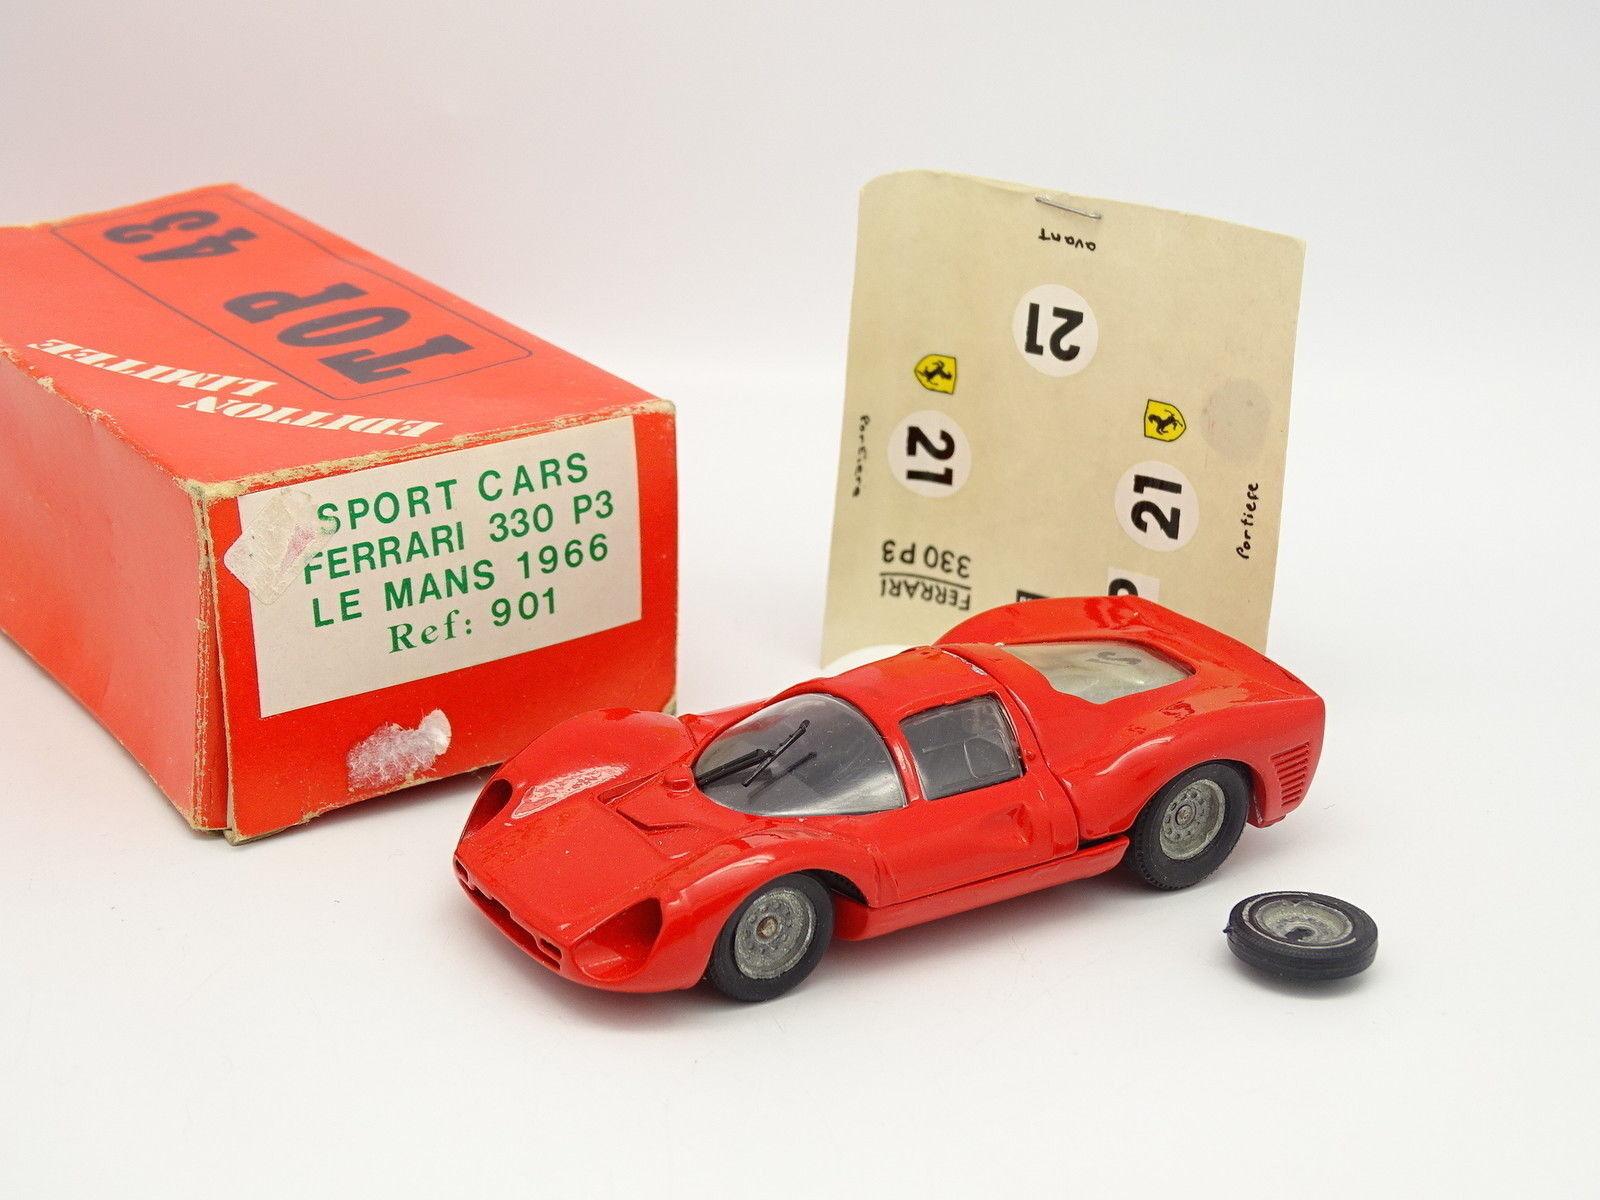 Solido + Transkit Top 43 1 43 - Ferrari 330 P3 Le Mans 1966 n°21